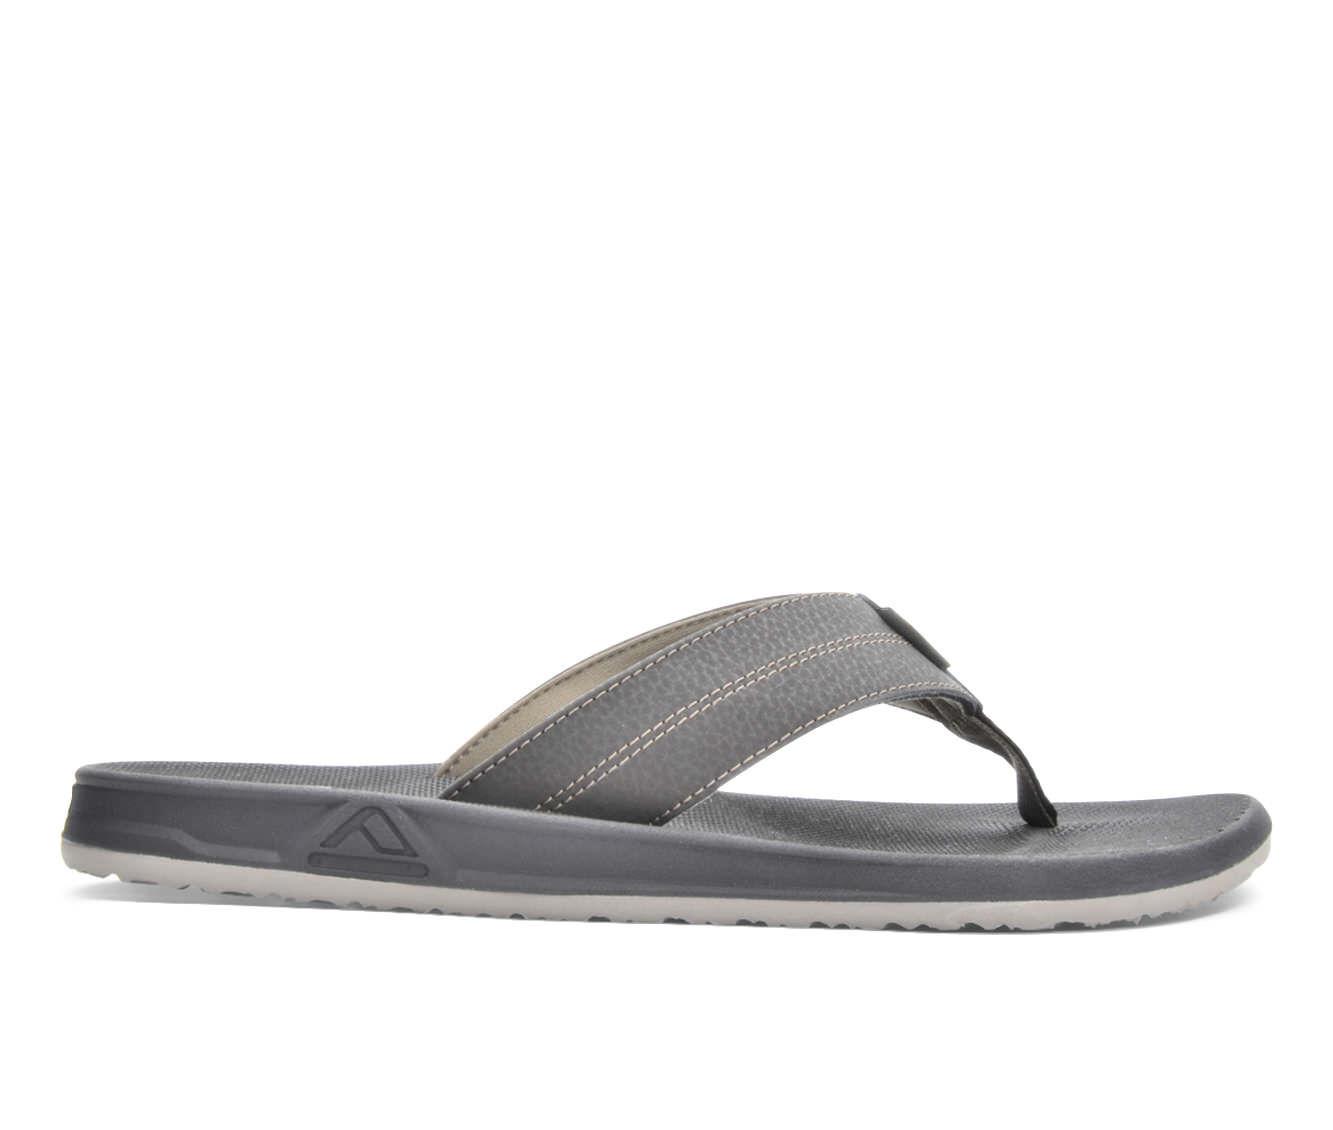 ELEMENT, Mens Flip Flop Sandals Reef